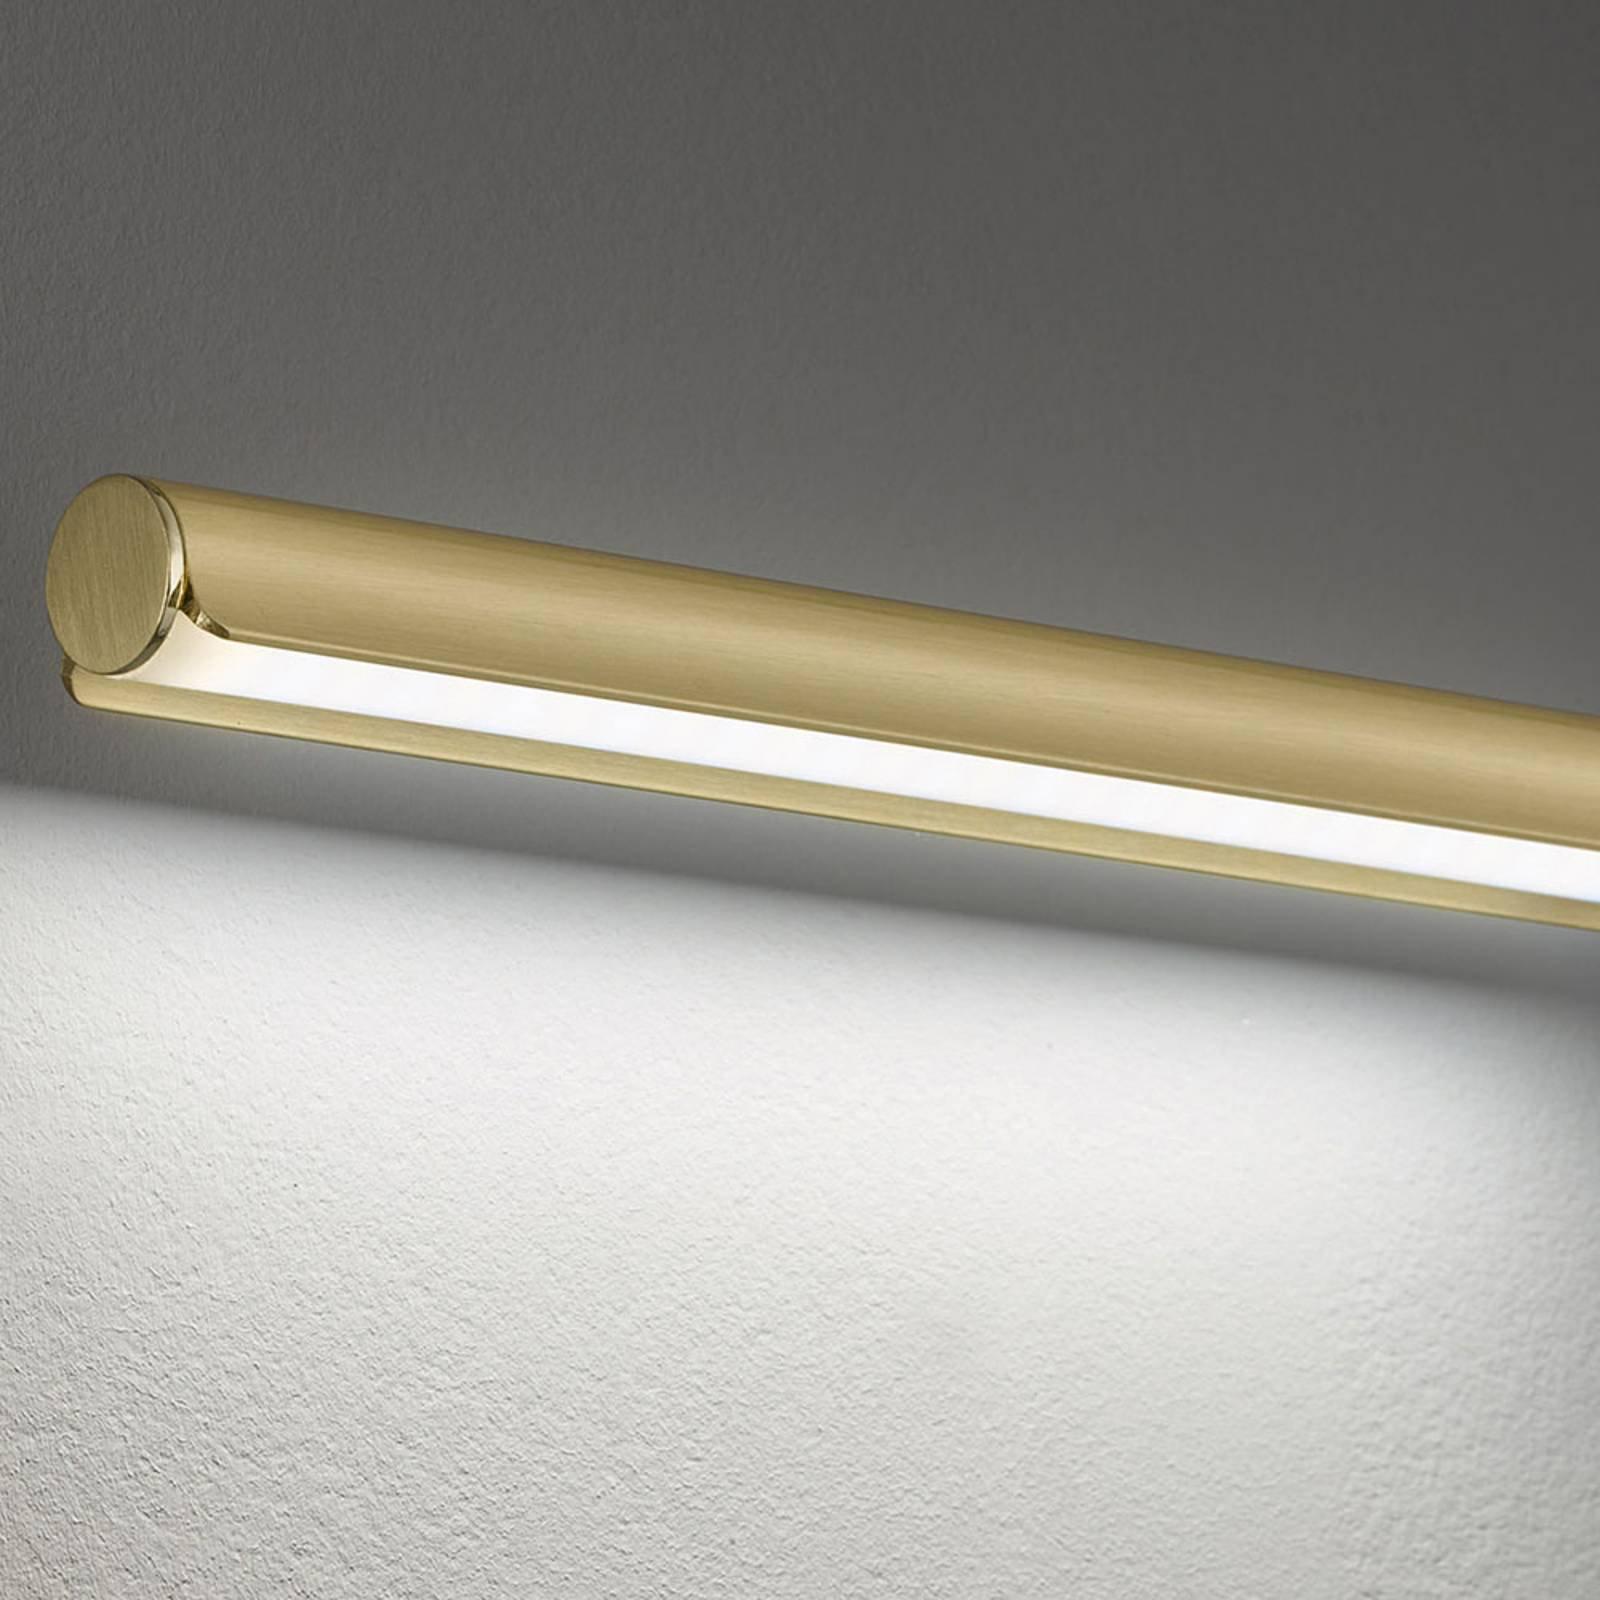 LED-vegglampe Nami med bryter, messingfarget